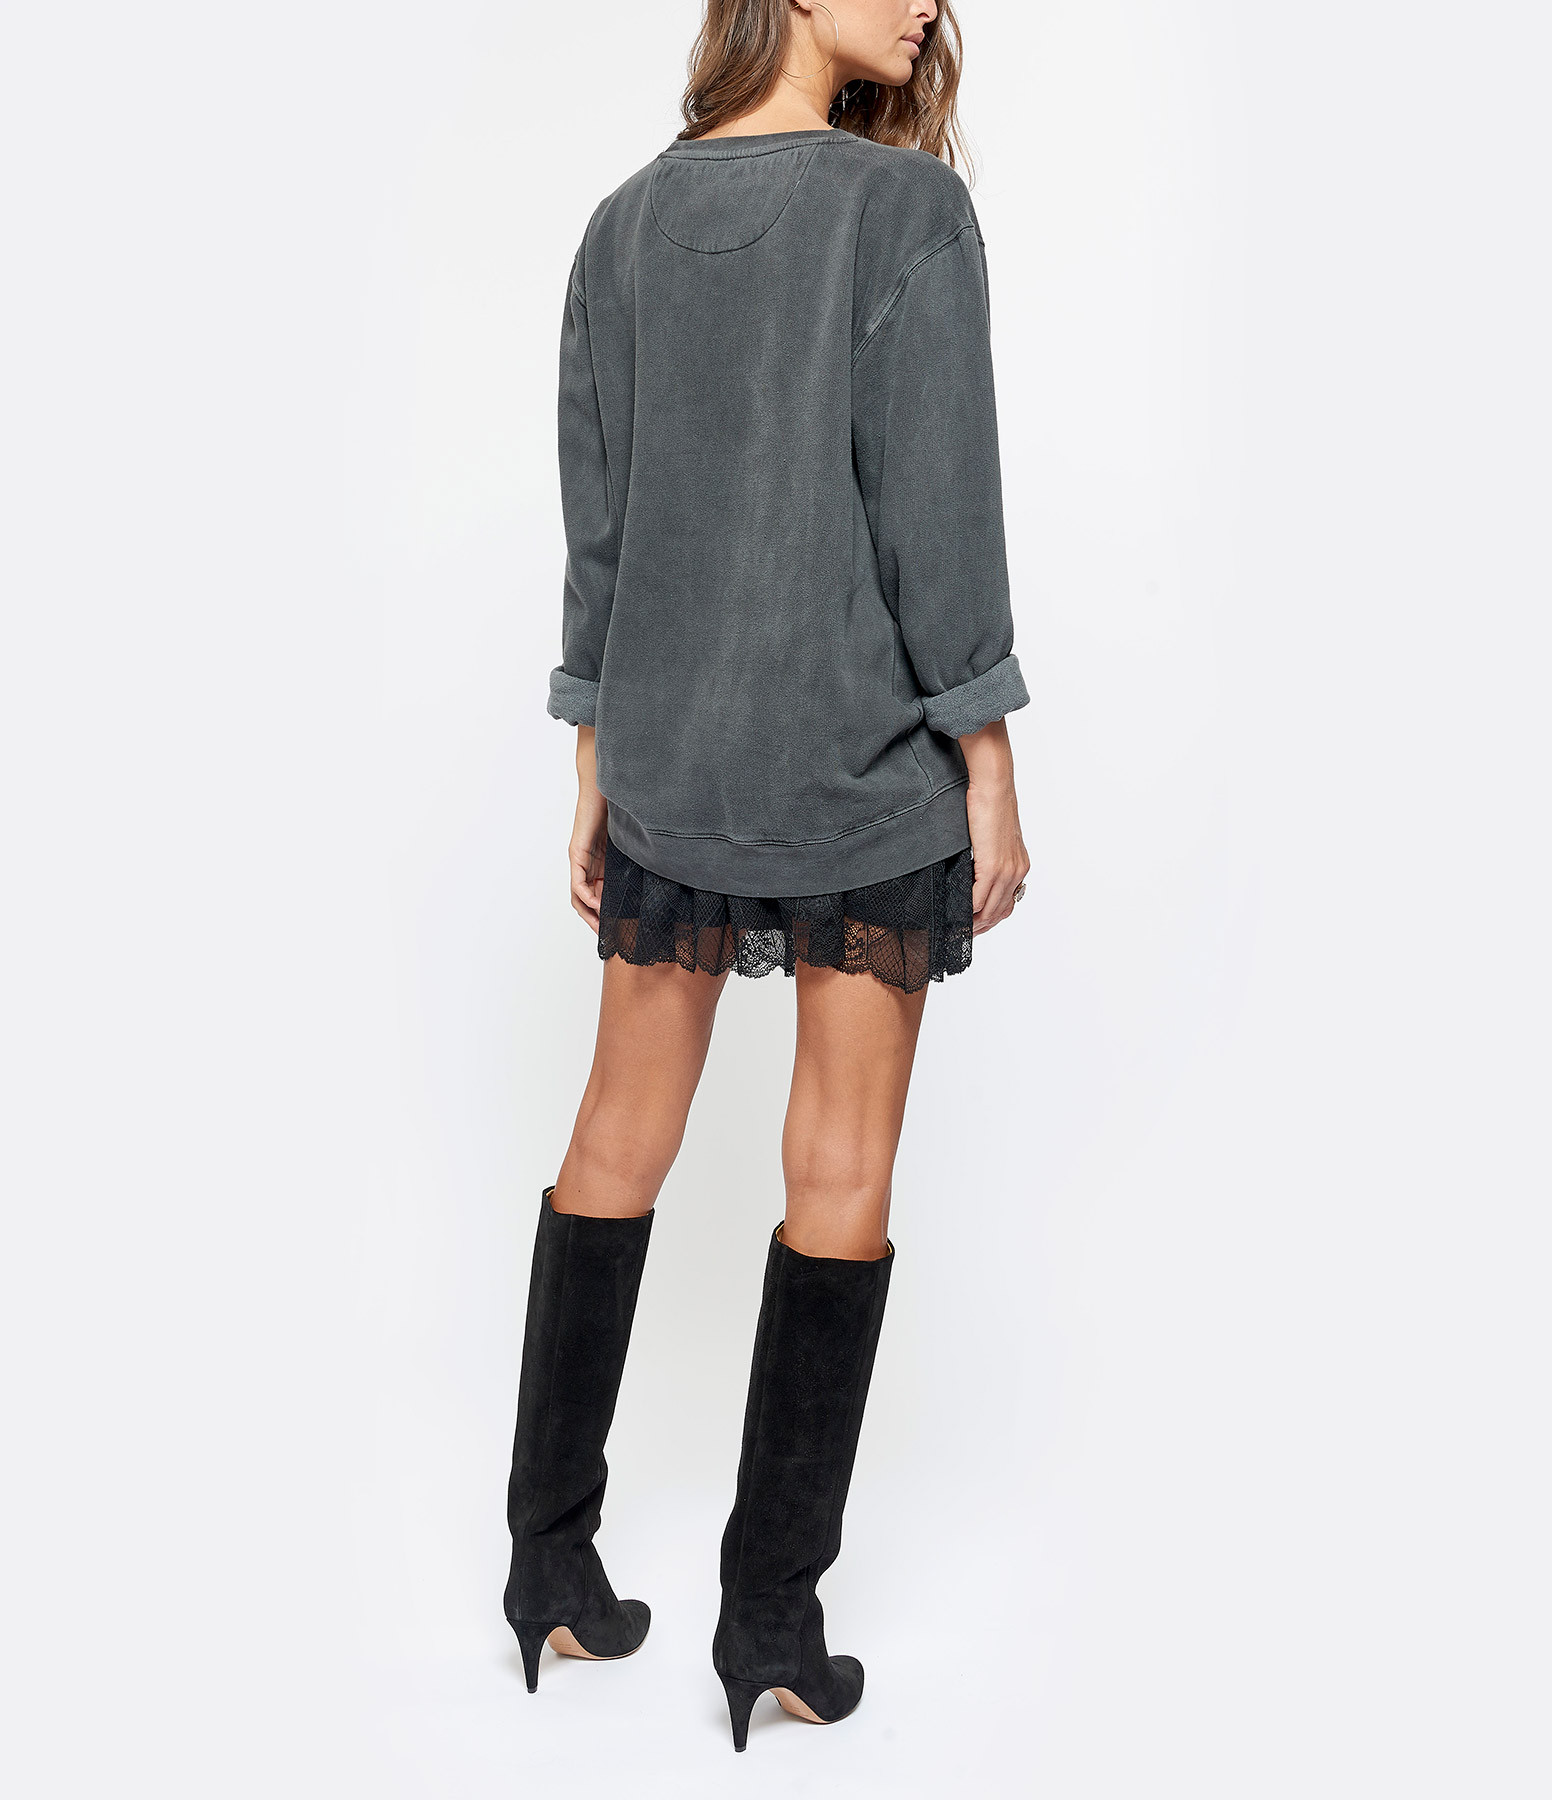 NEWTONE - Sweatshirt Its Rockin L.A Coton Pepper